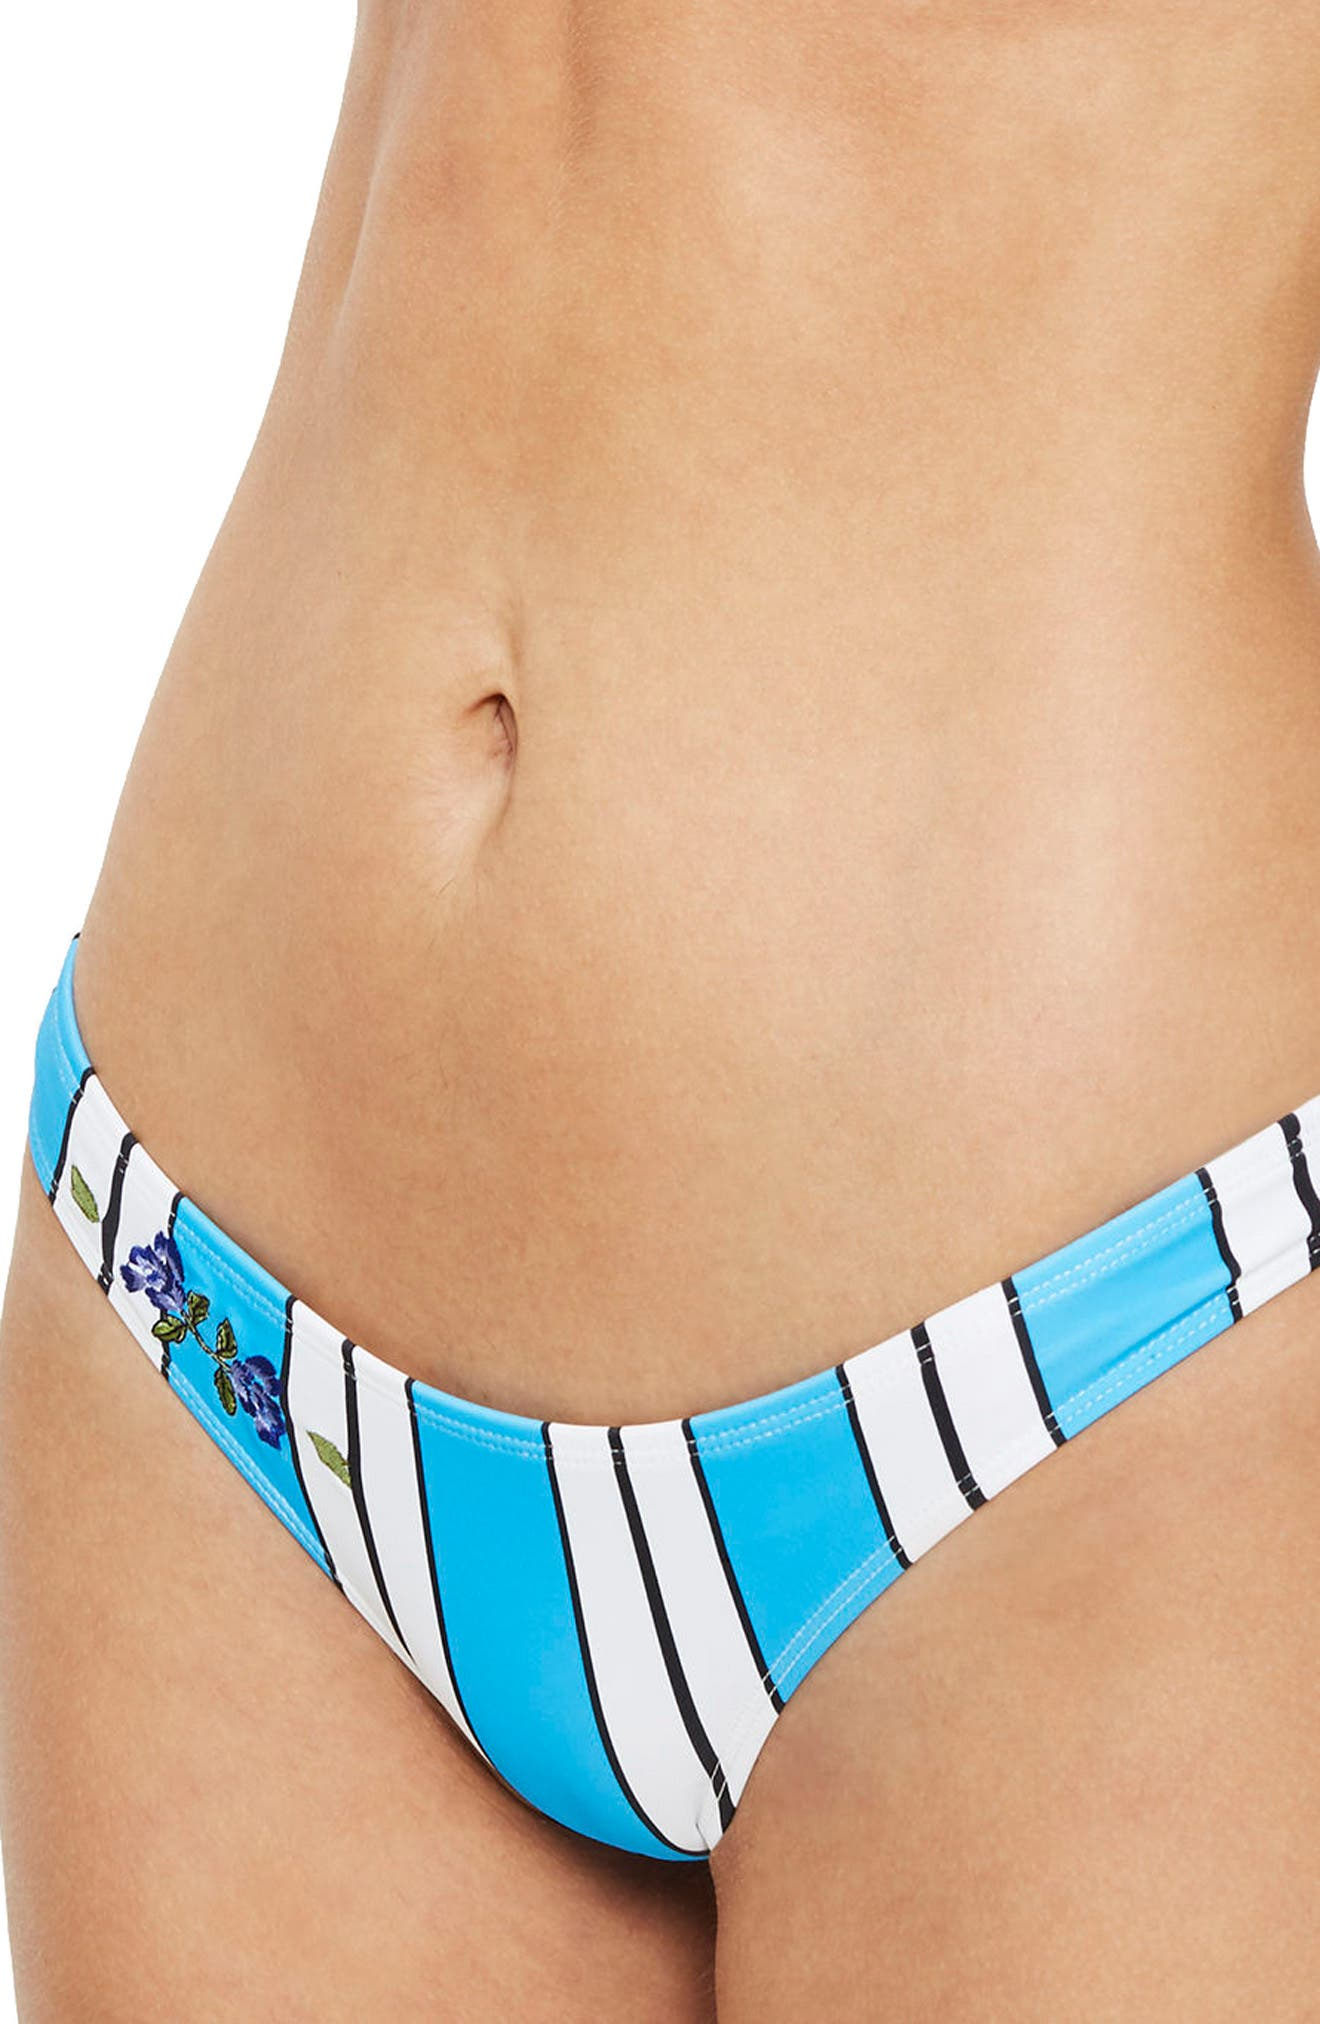 Stripe Floral Embroidered High Leg Bikini Bottoms,                             Main thumbnail 1, color,                             Blue Multi